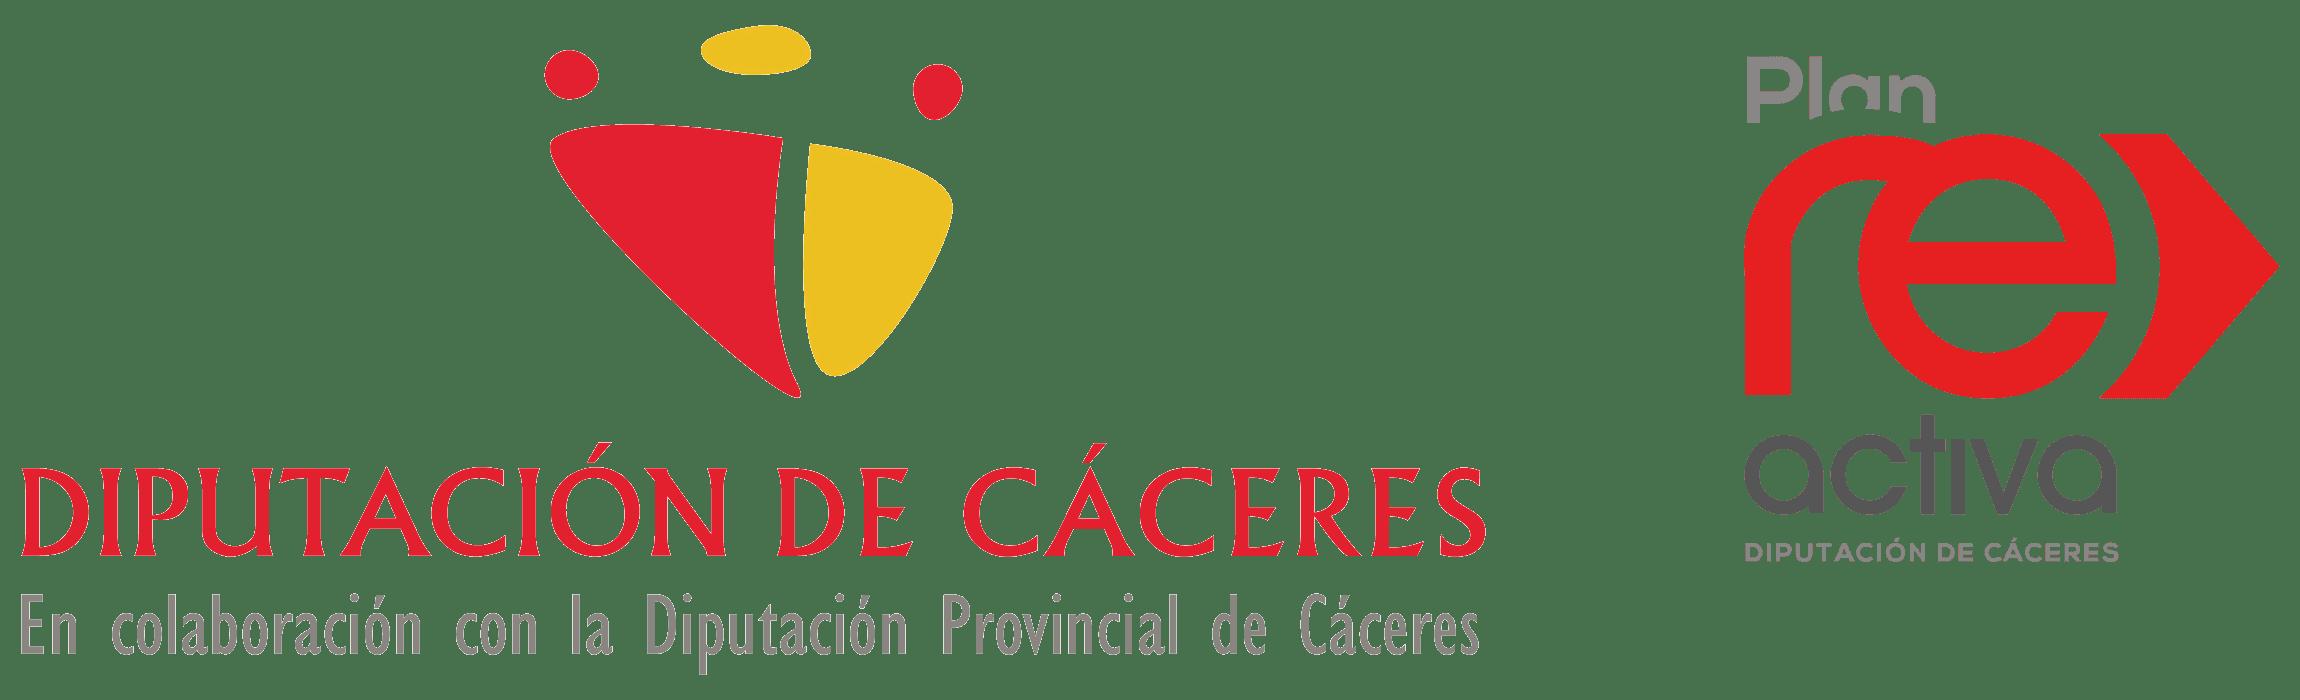 Logotipo diputacion Caceres